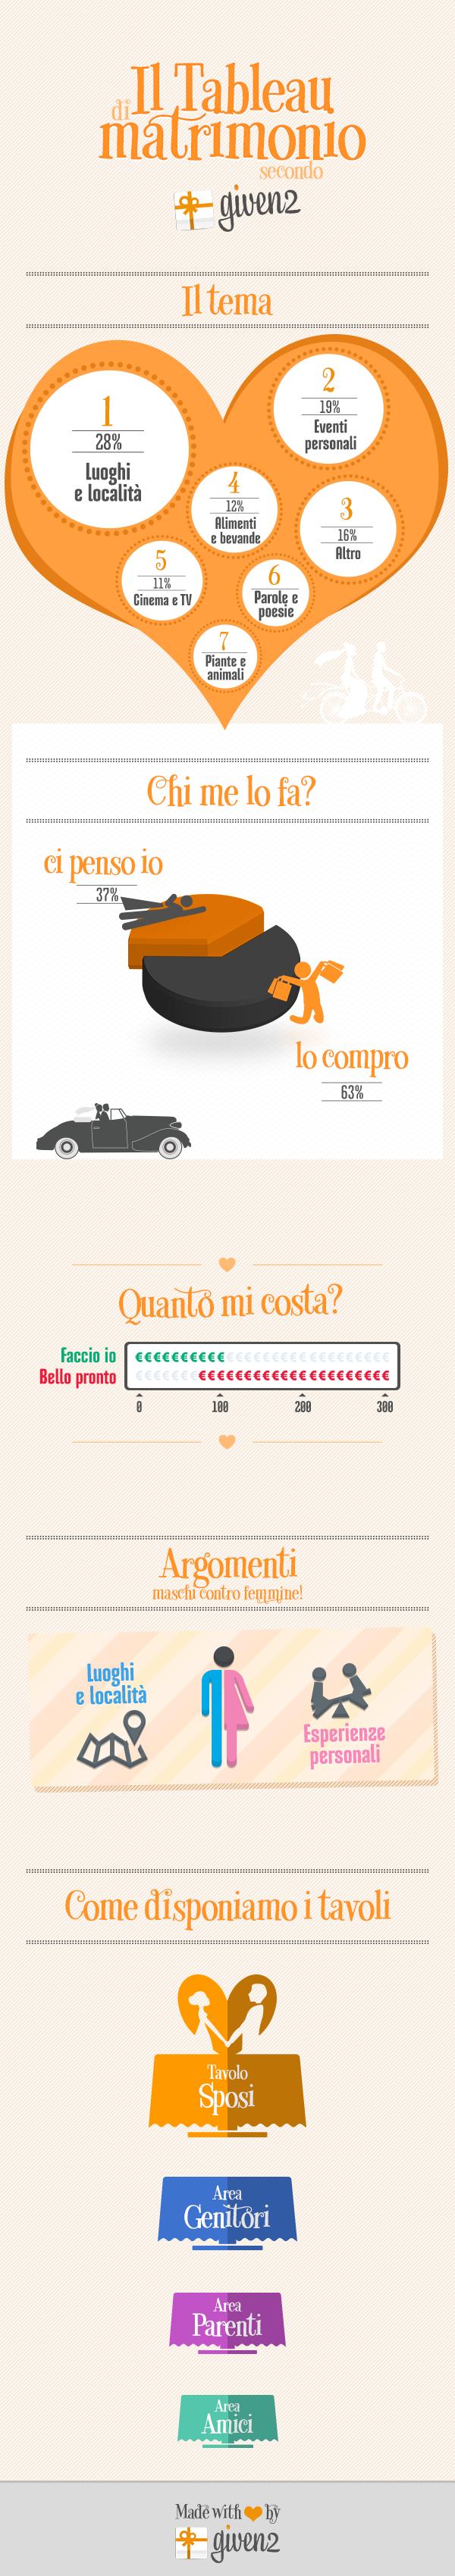 tableau matrimonio infografica given2